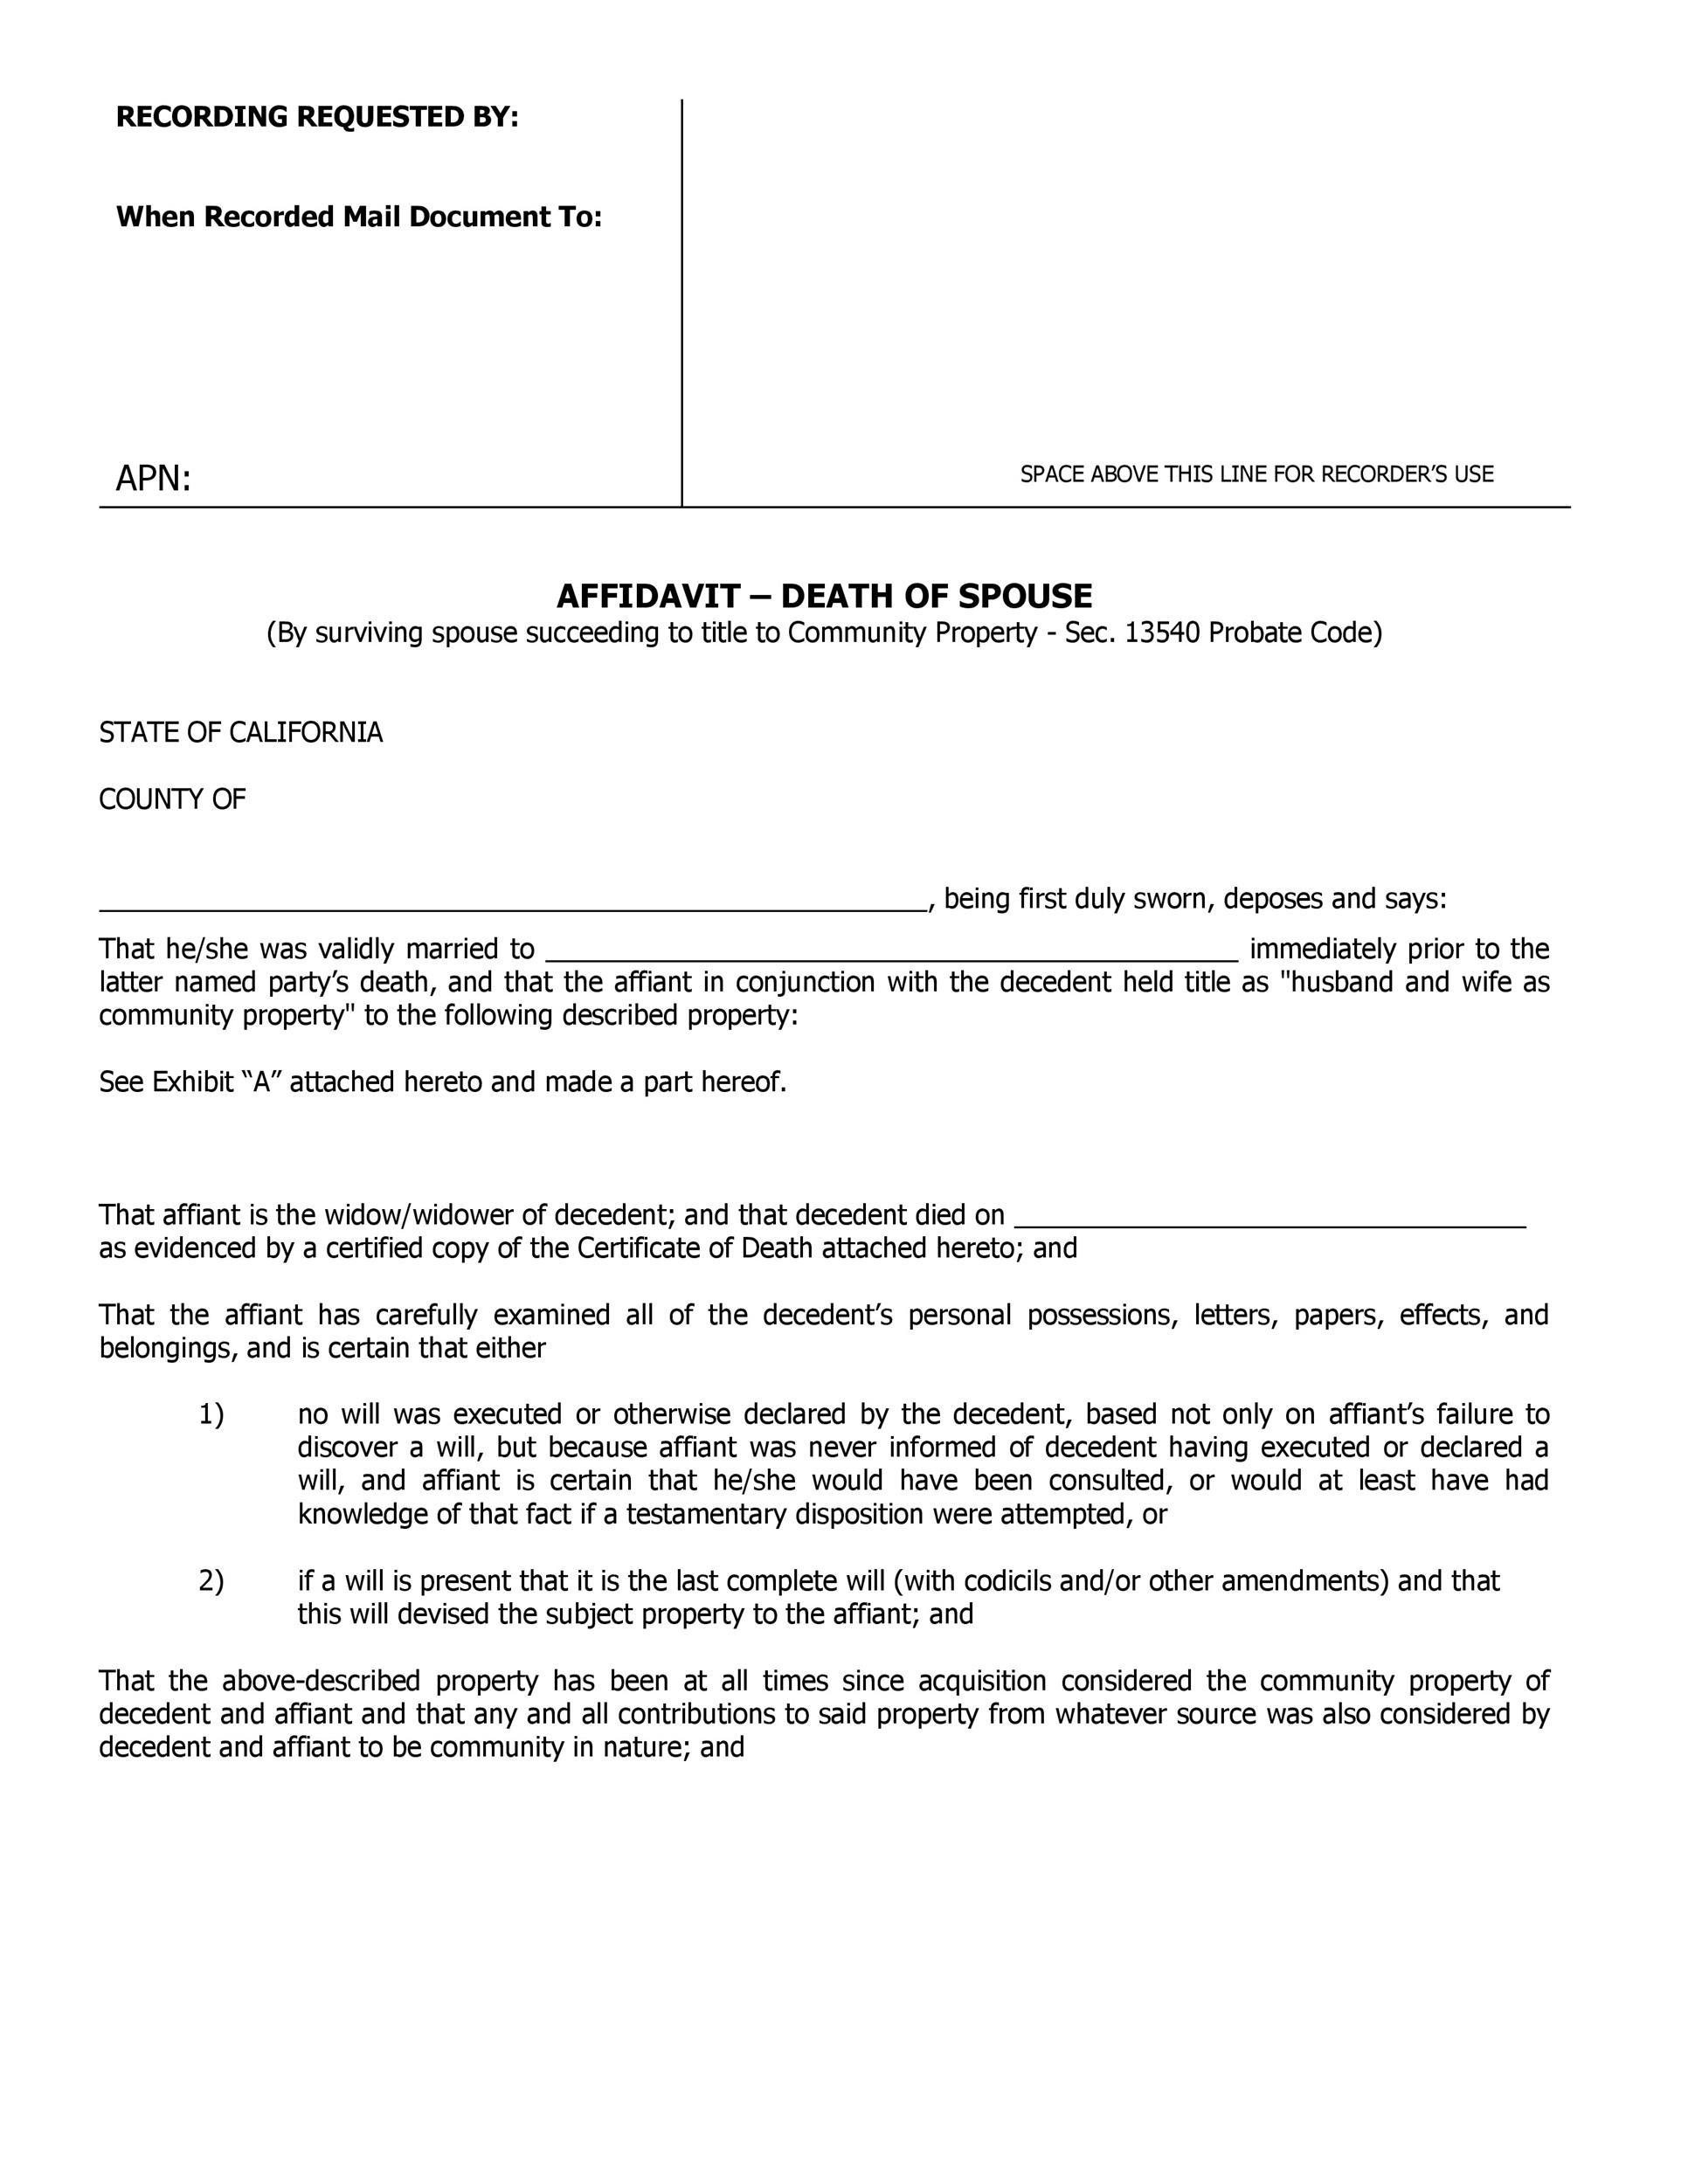 Free affidavit of death 15